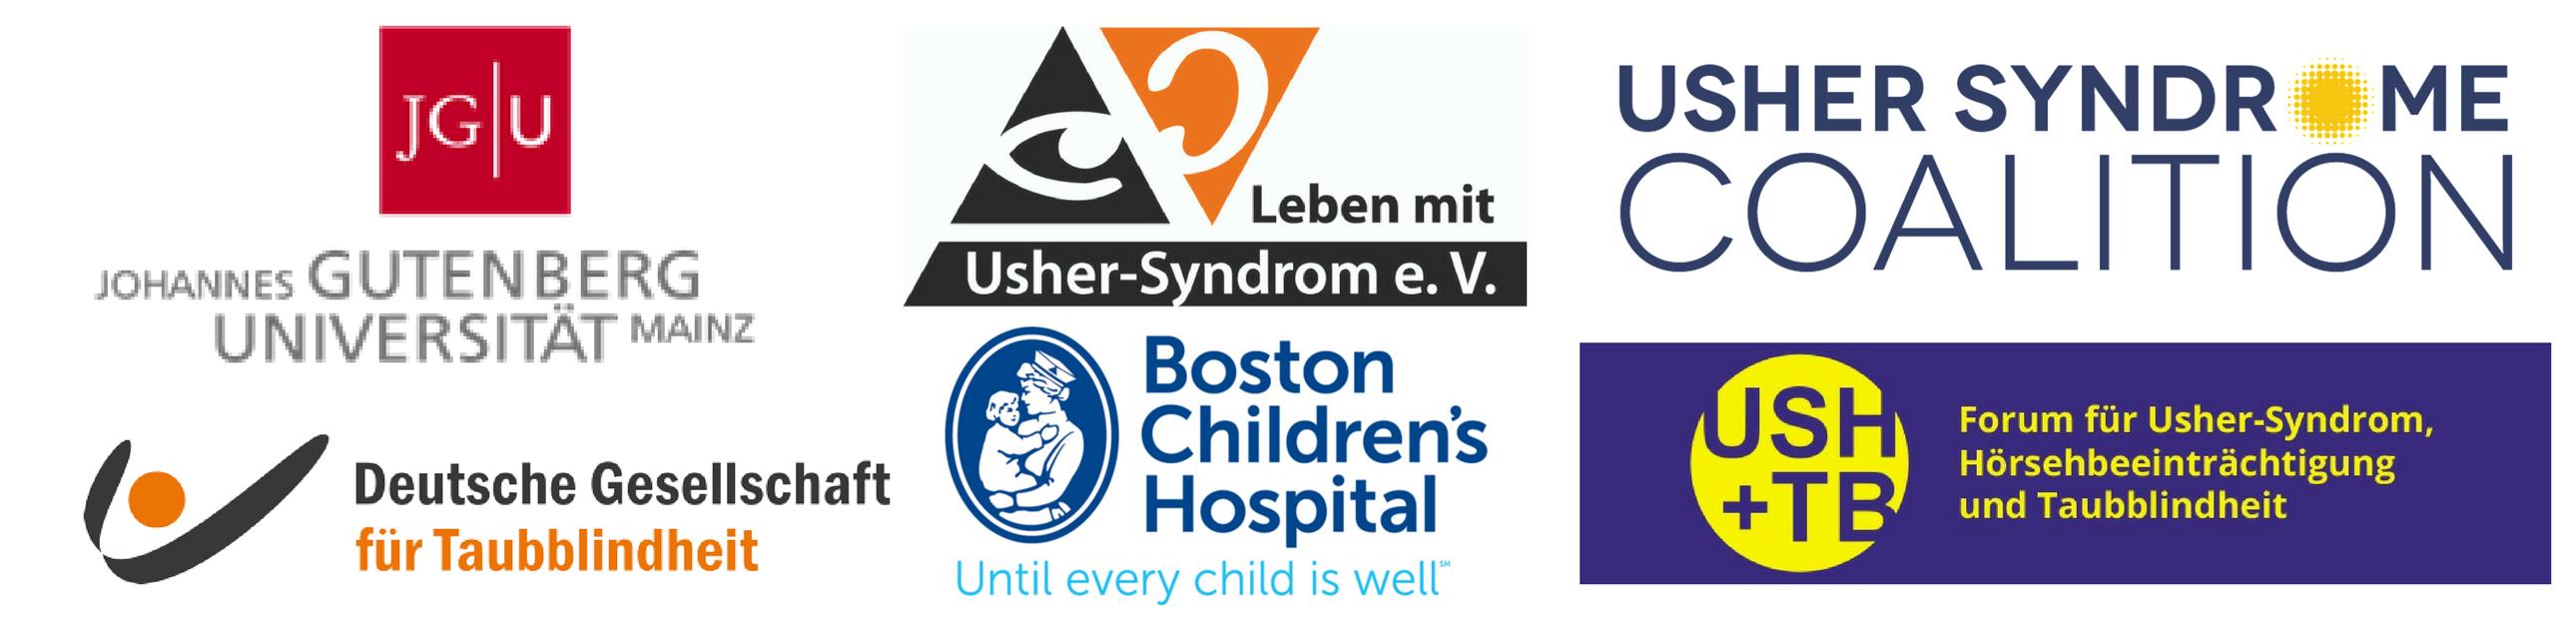 USH2018 Partner logos: Johannes Gutenberg Universitat Mainz, Deutsche Gesellschaft fur Taubblindheit, Boston Children's Hospital, Usher Syndrome Coalition, Leben mit Usher-Syndrom e.V., USH+TB Forum fur Usher-syndrom, Horsehbeeintrachtigung und Taubblindhelt